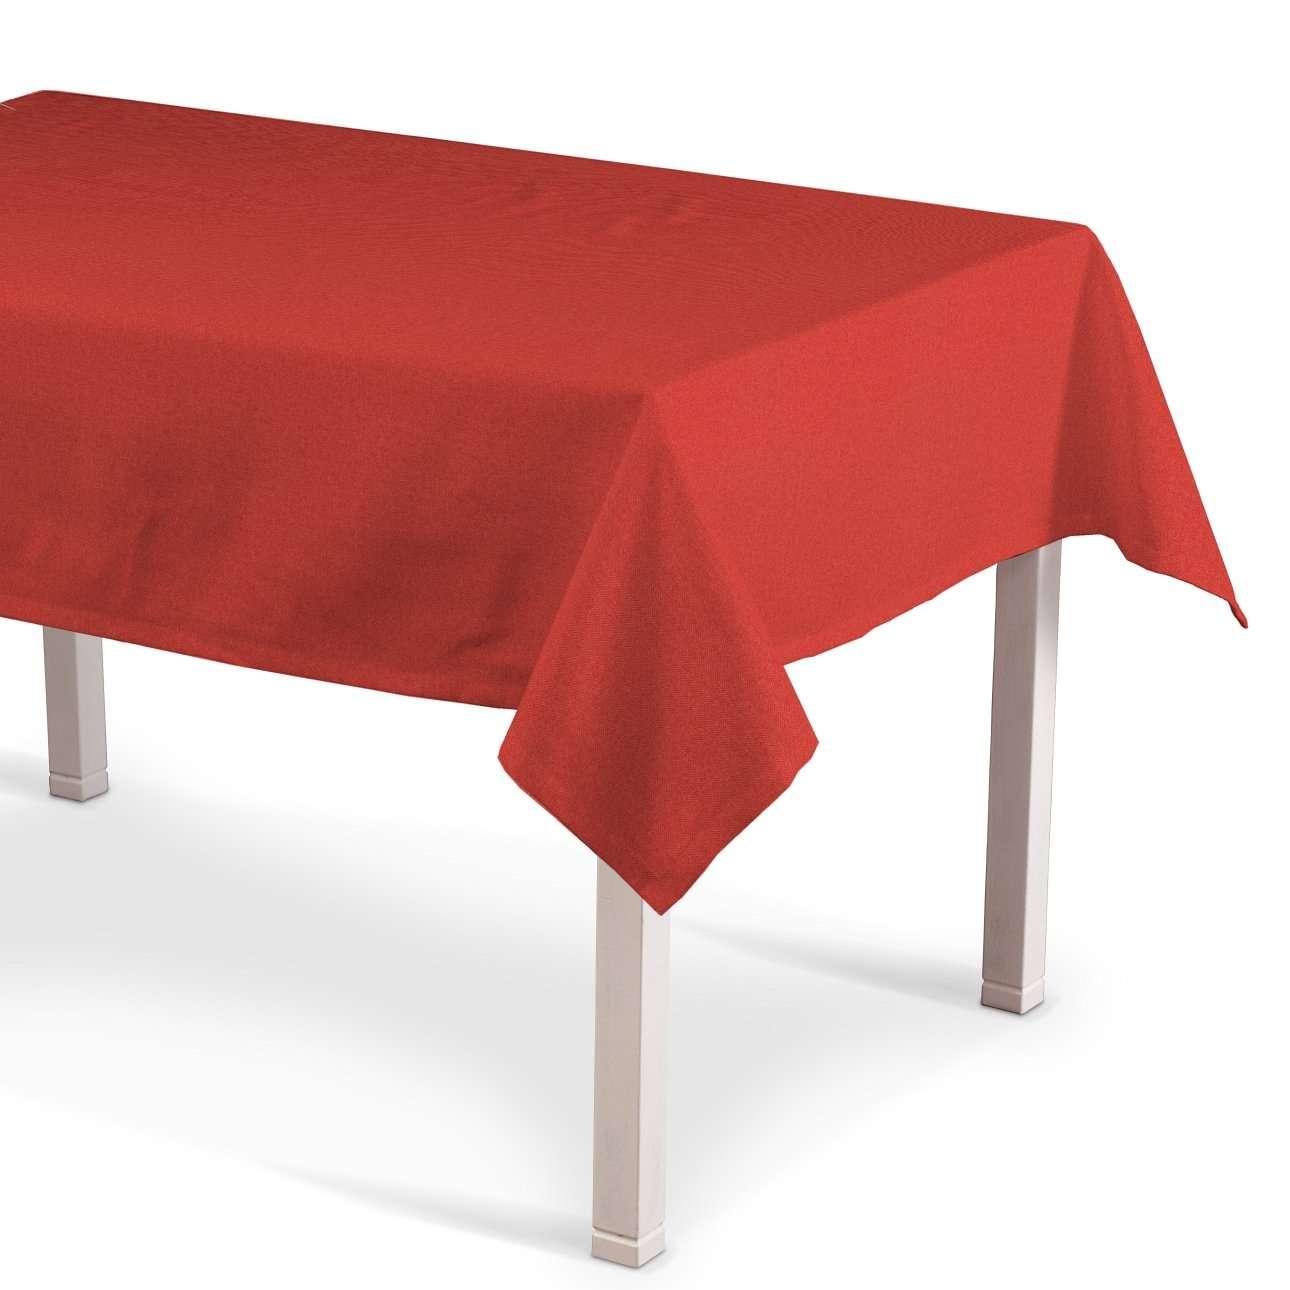 Rectangular tablecloth in collection Edinburgh, fabric: 142-33